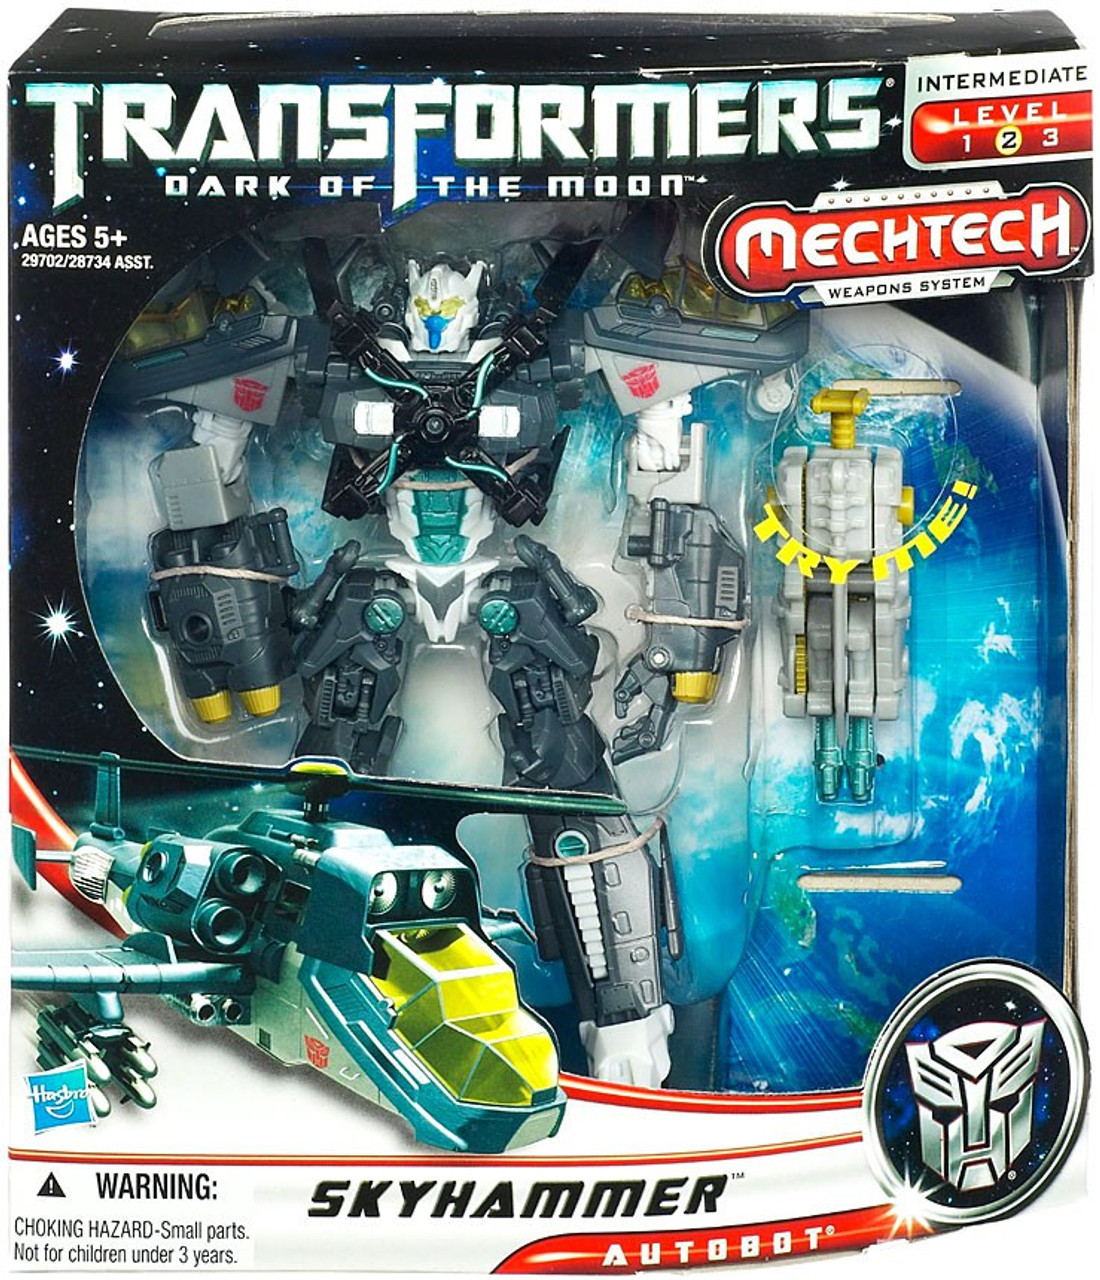 Transformers Dark of the Moon Mechtech Voyager Skyhammer Voyager Action Figure